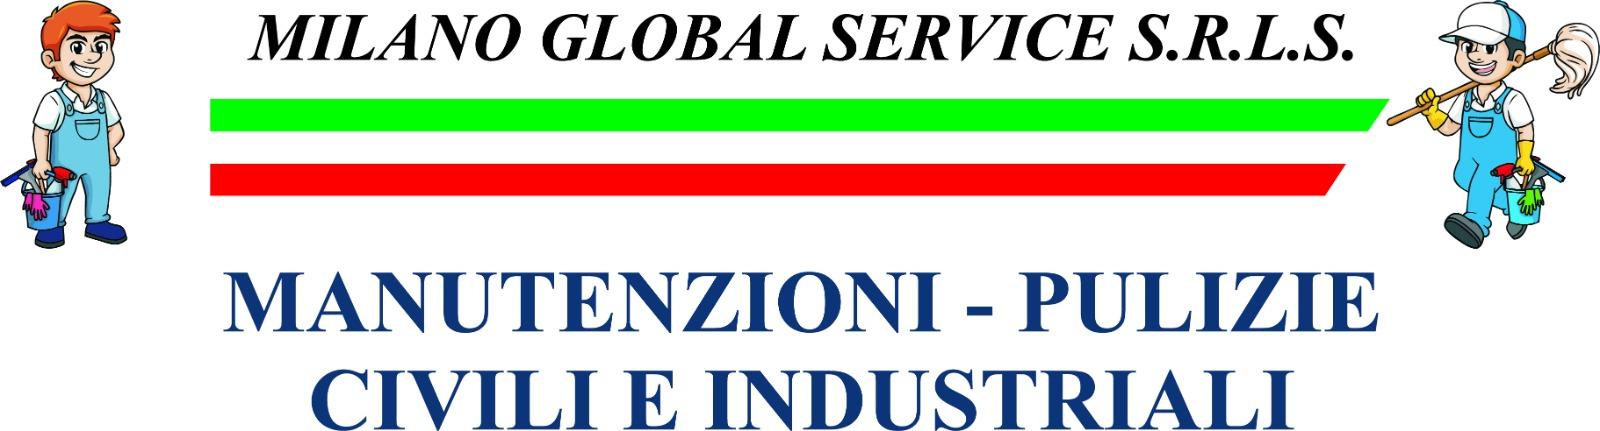 Milano Global Service